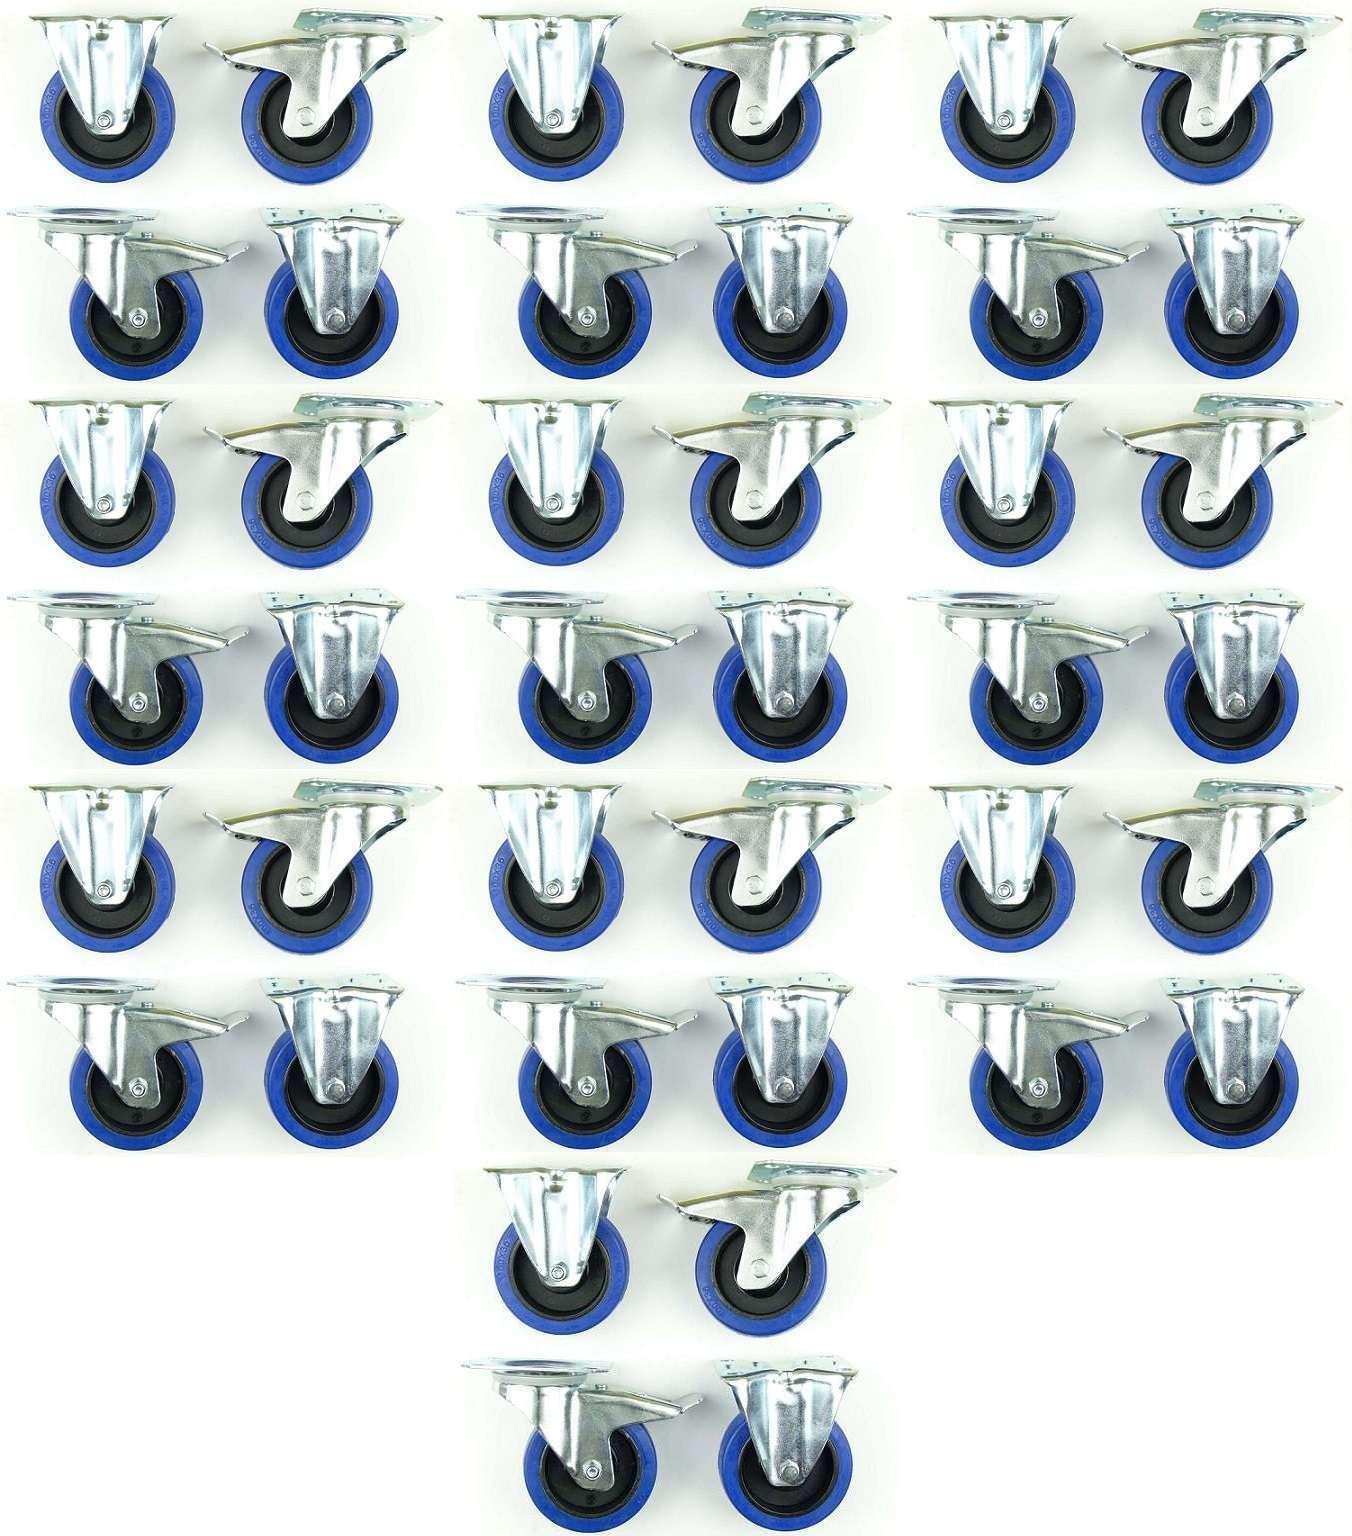 10 Set 100 mm SL Rollen Transportrollen Bockrollen Blau Wheels Schwerlast BREMSE